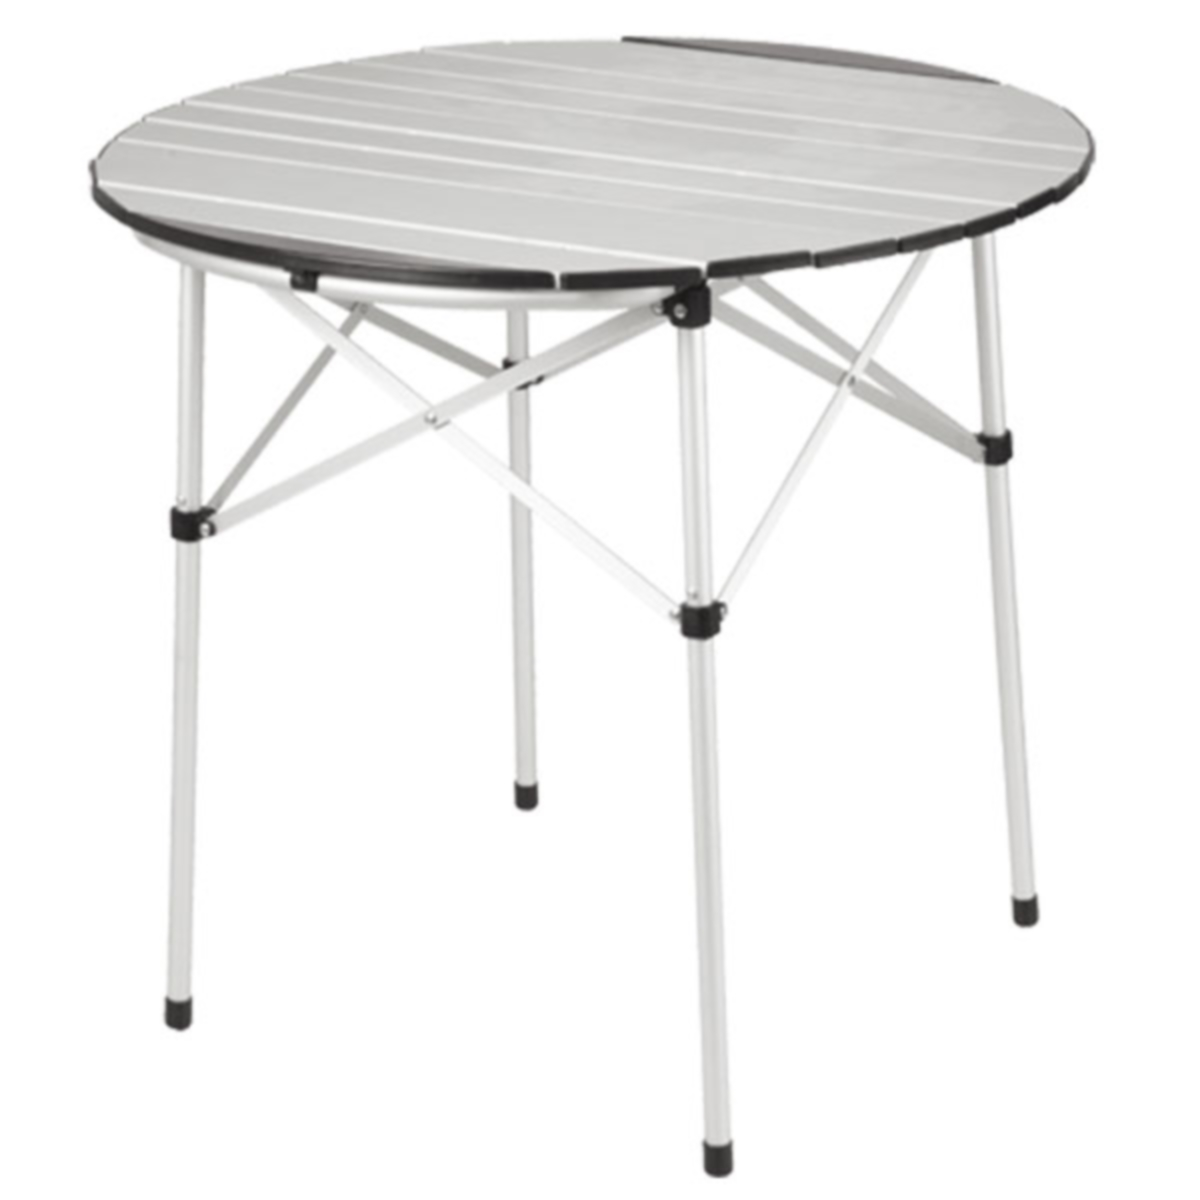 Royal Blenheim Round Folding Aluminium Camping Table